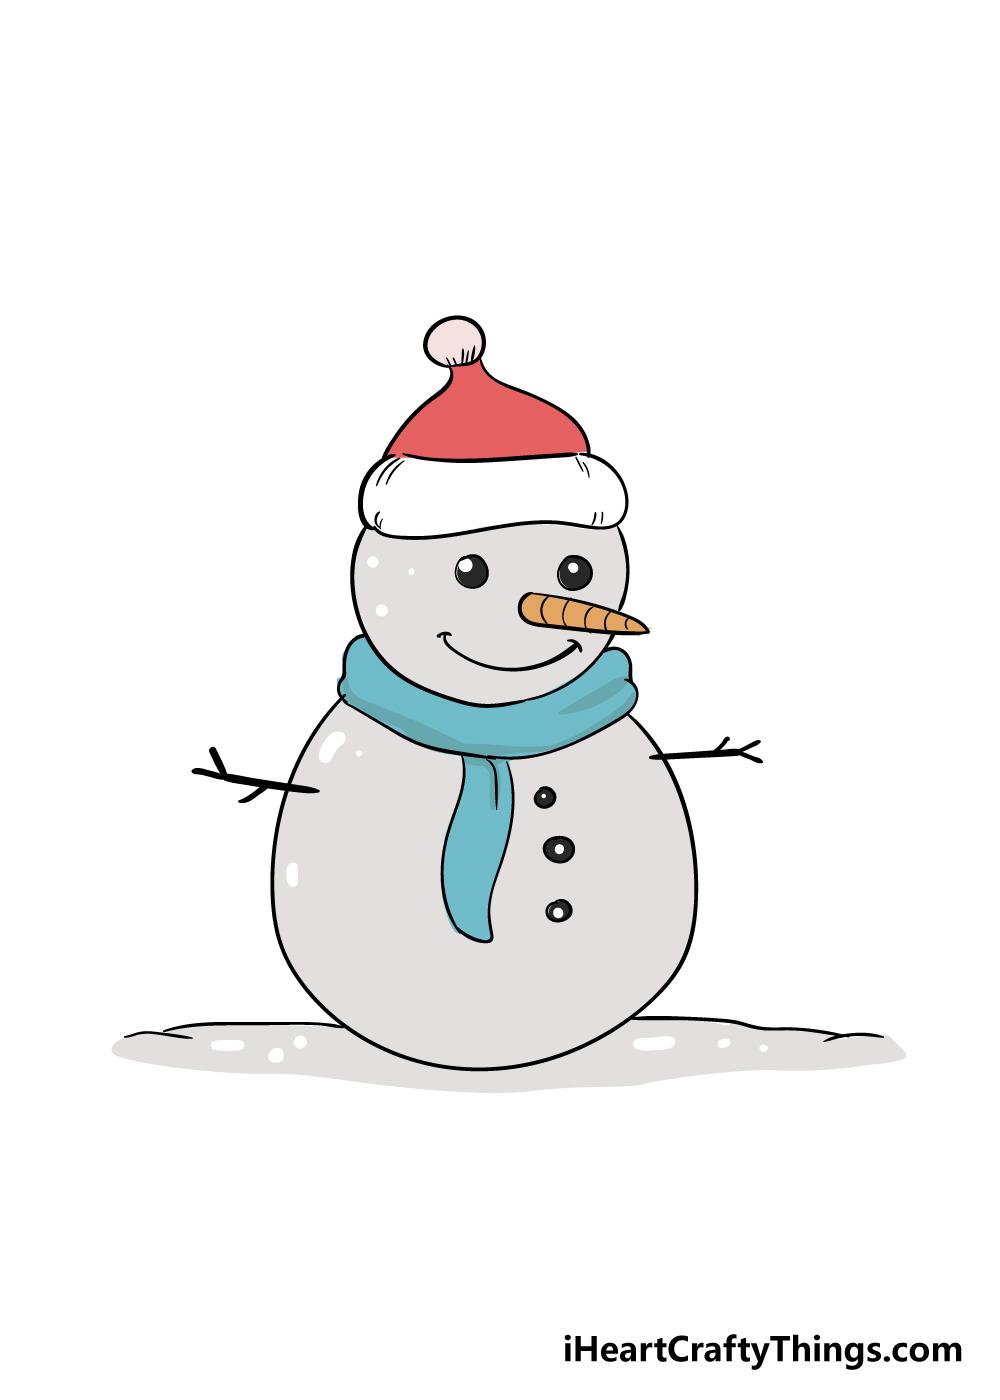 snowman drawing step 7